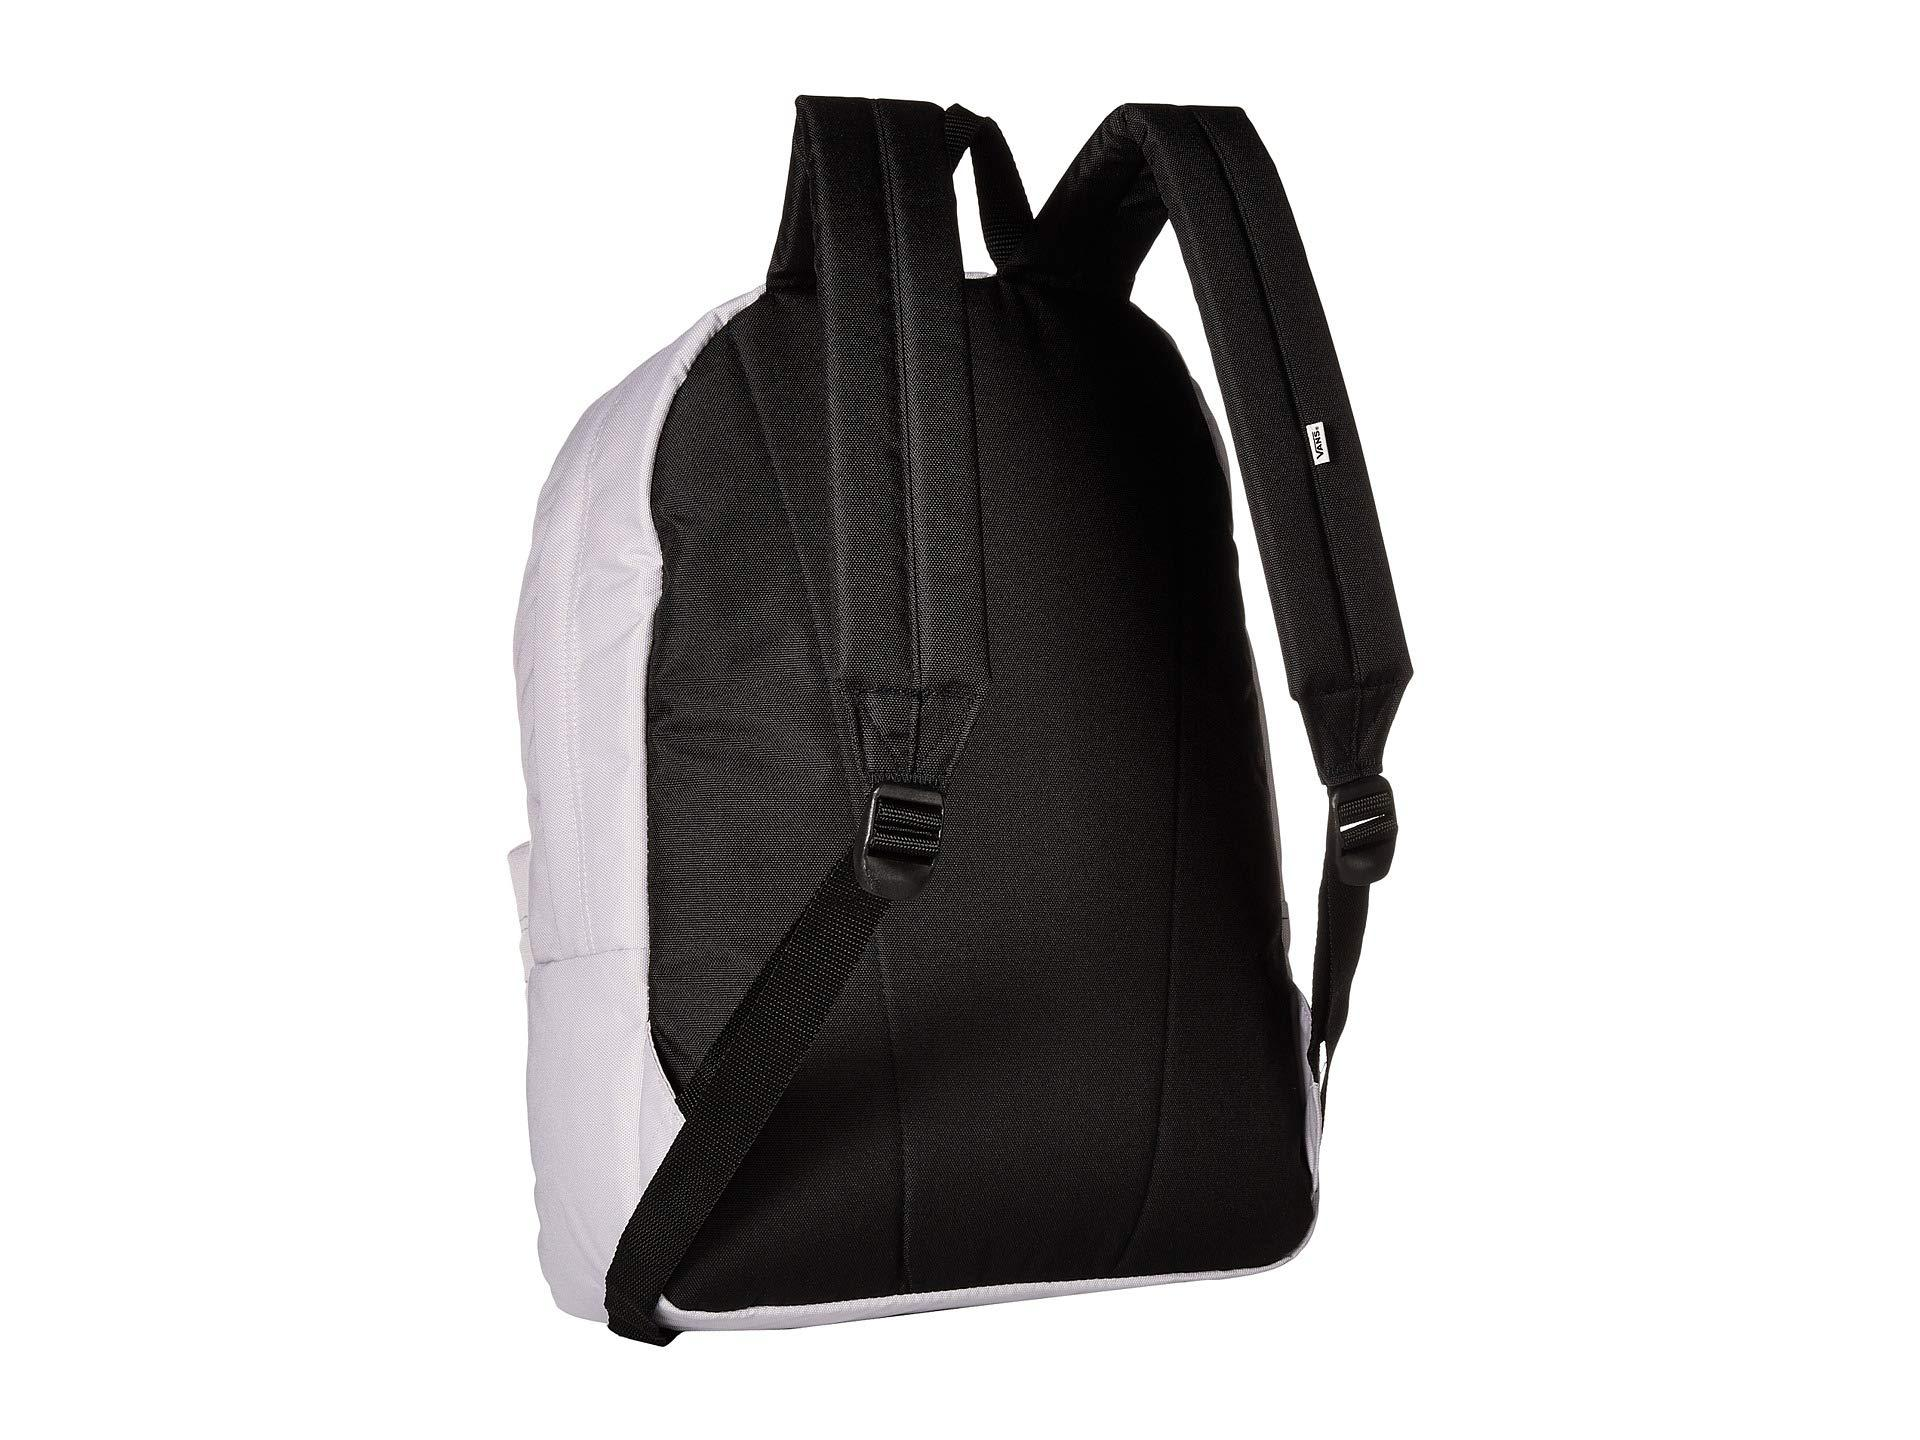 ee25f0ce9d71 Vans - Black Realm Backpack (satin Floral) Backpack Bags - Lyst. View  fullscreen